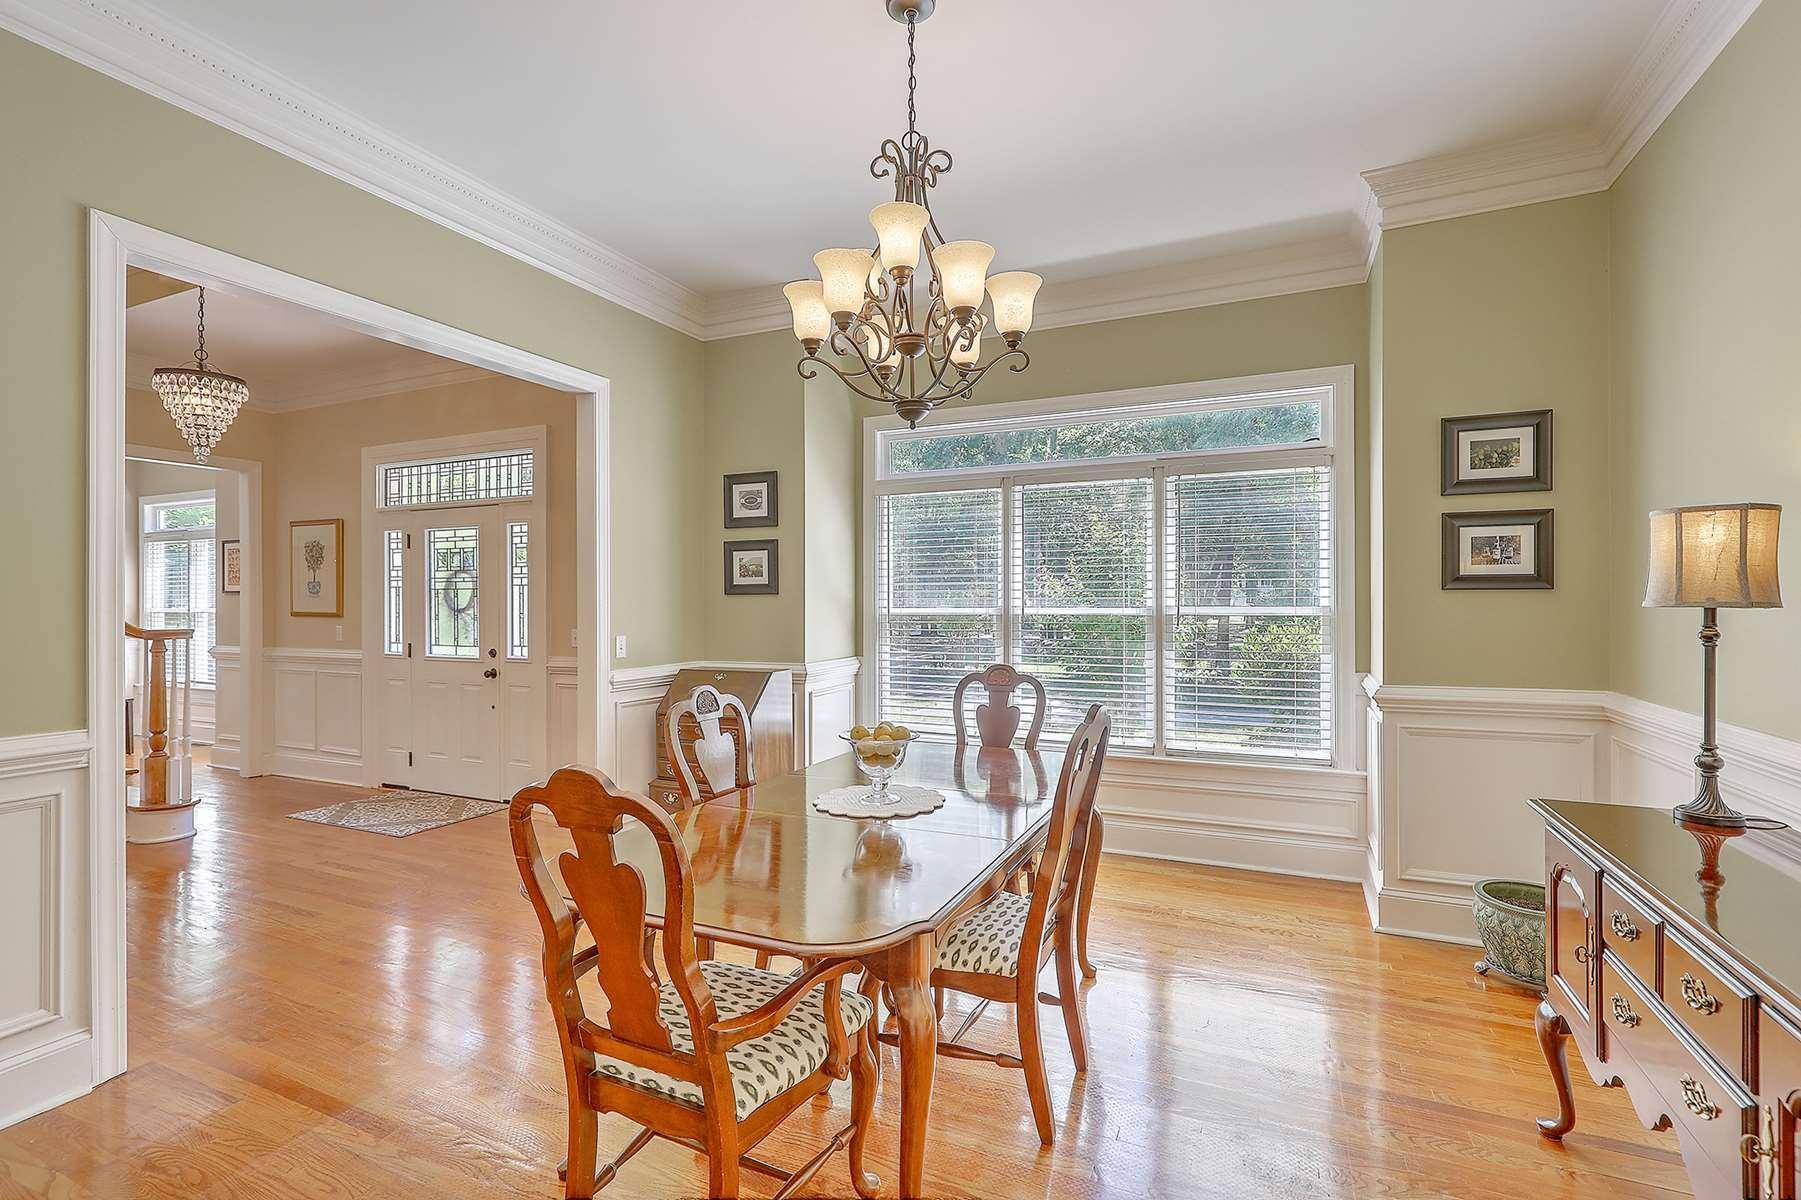 Dunes West Homes For Sale - 2961 Pignatelli, Mount Pleasant, SC - 38